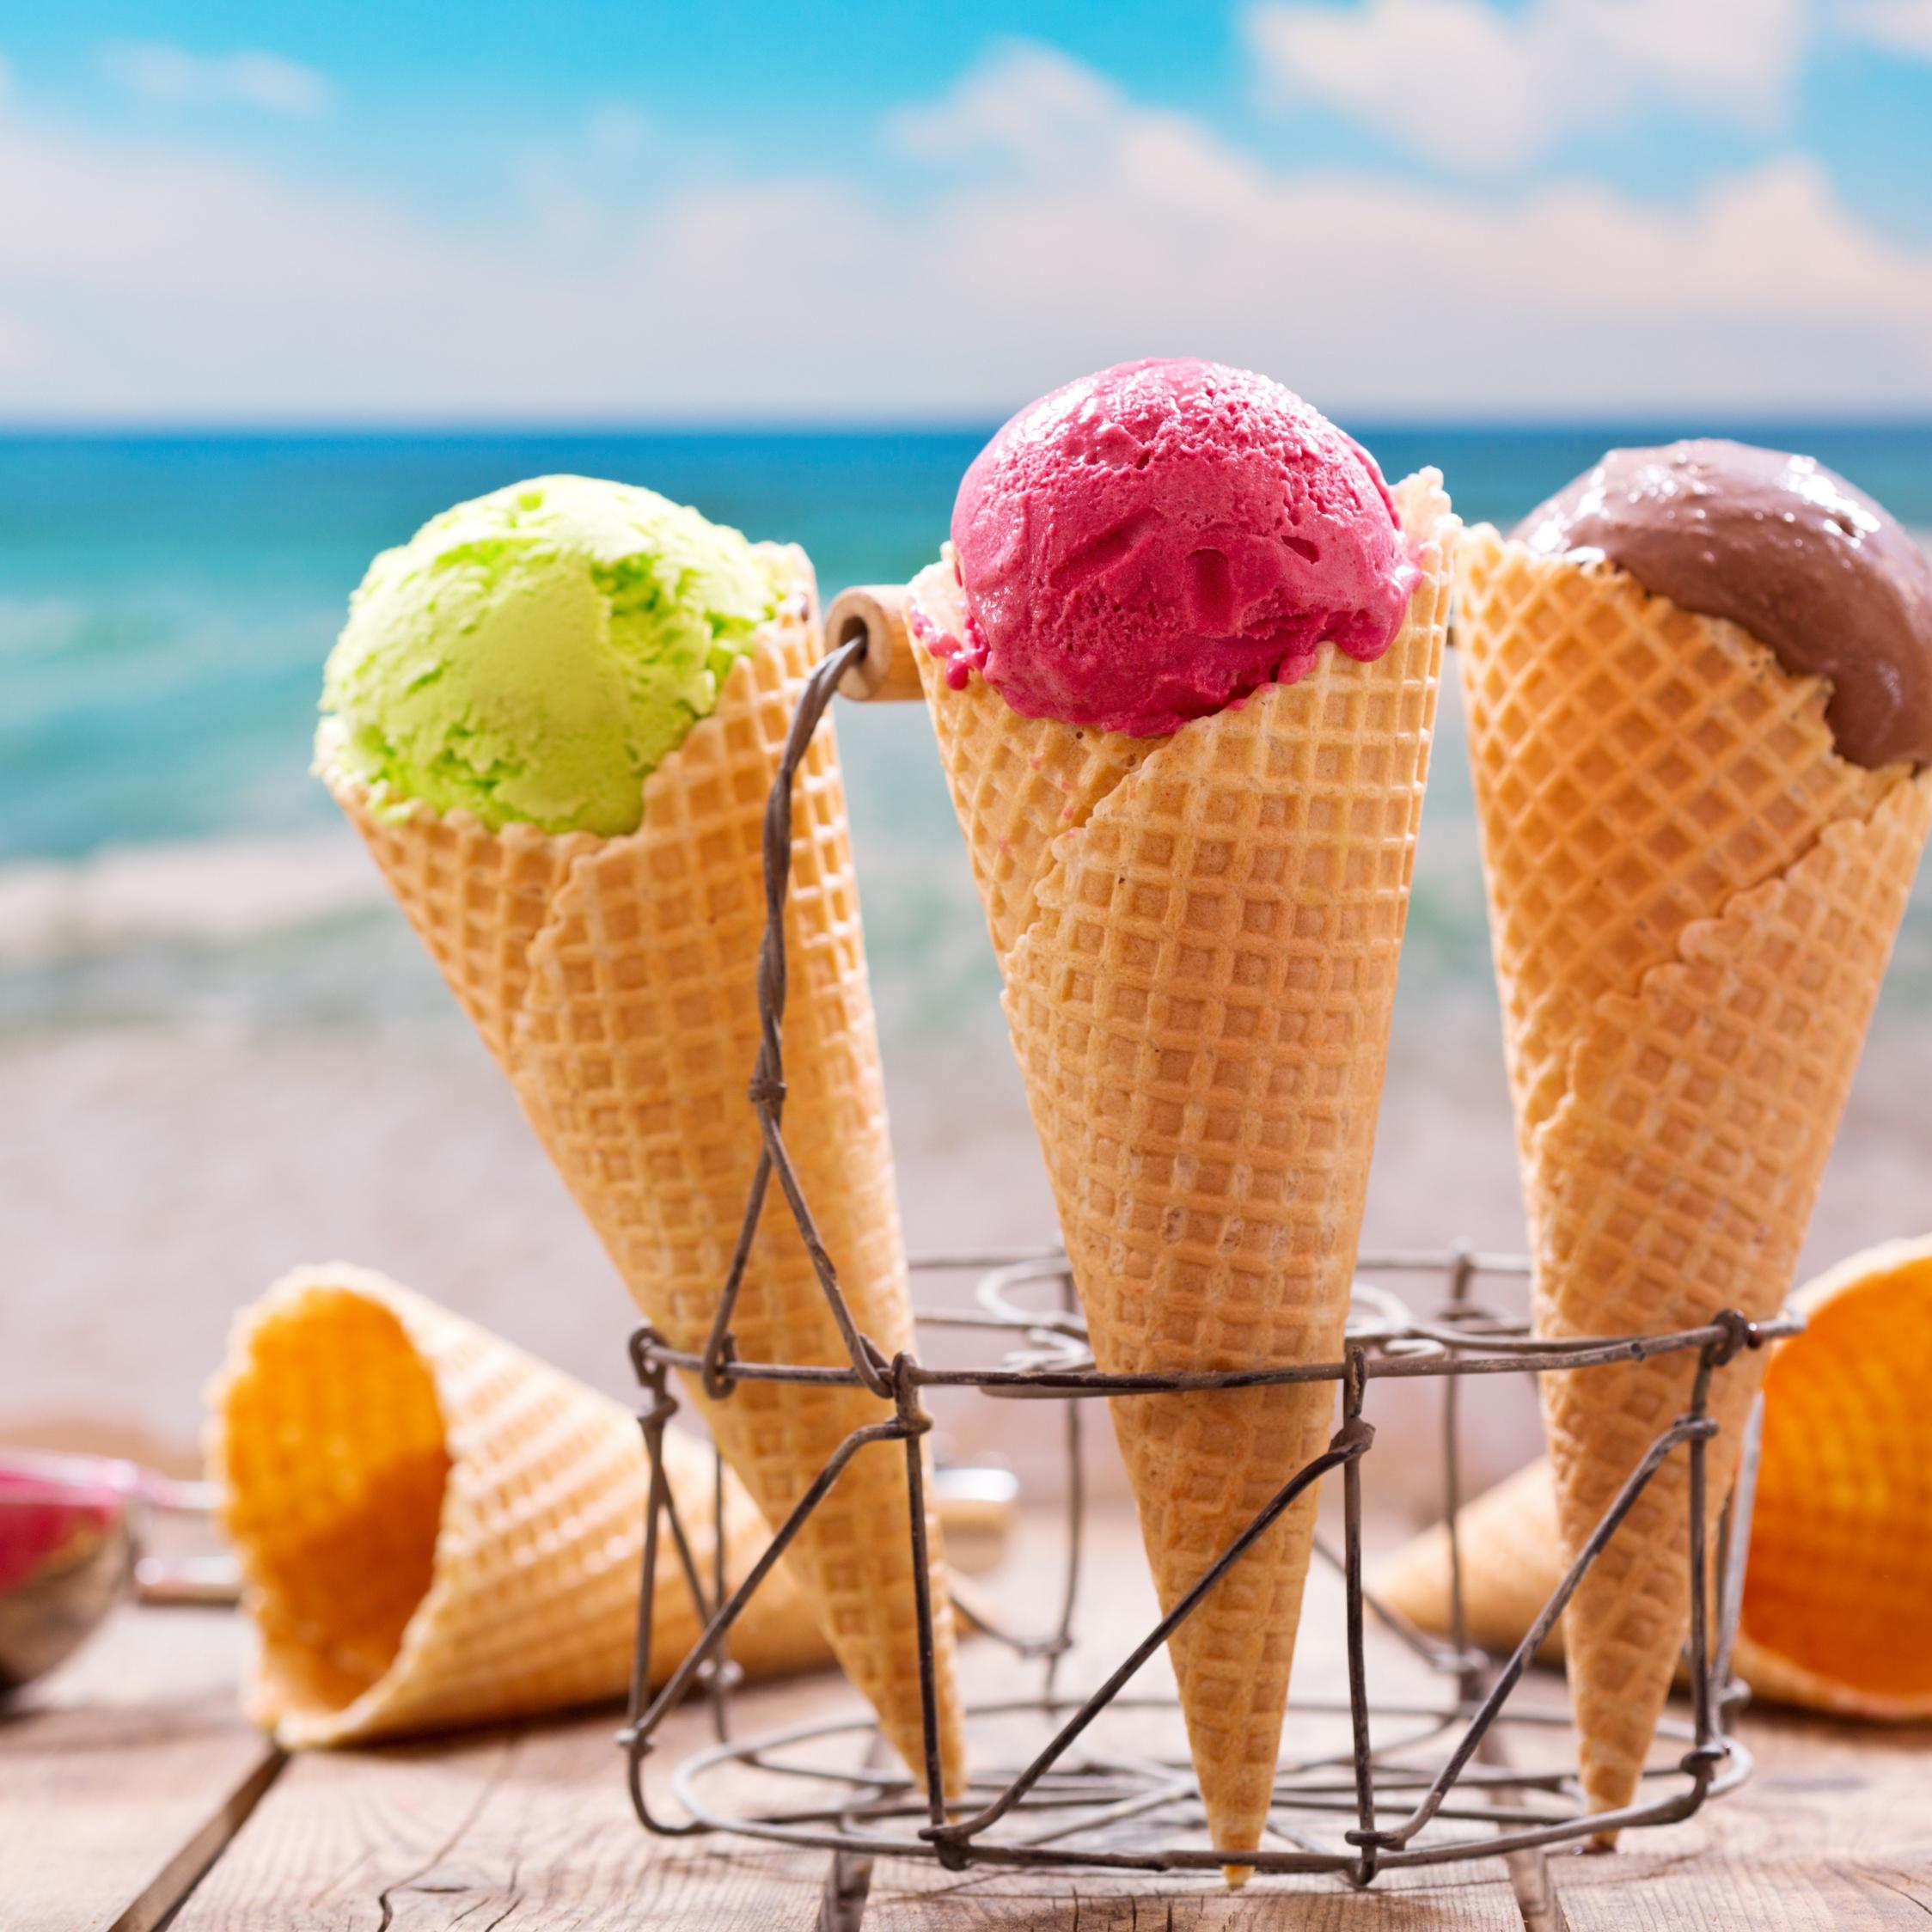 Ice Cream Cone Wallpaper: Download 2248x2248 Wallpaper Ice Cream, Waffle Cones